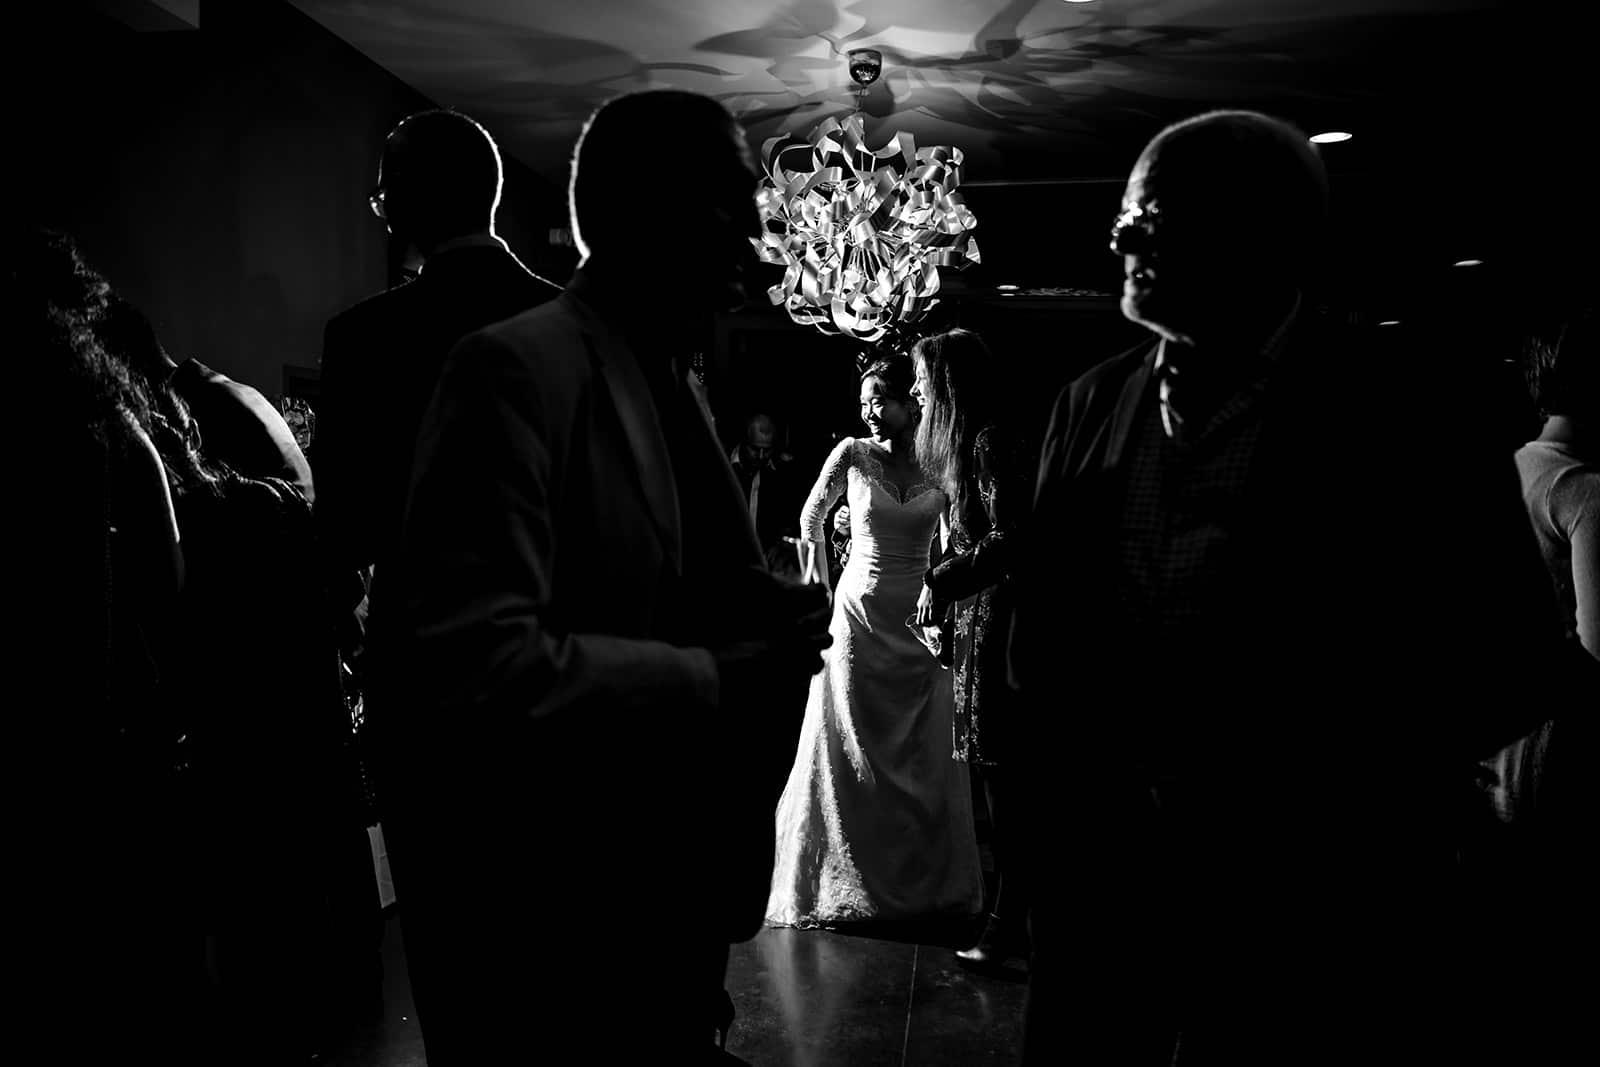 Intimate wedding photographer Aix les Bains Photographe de mariage intime Aix les Bains